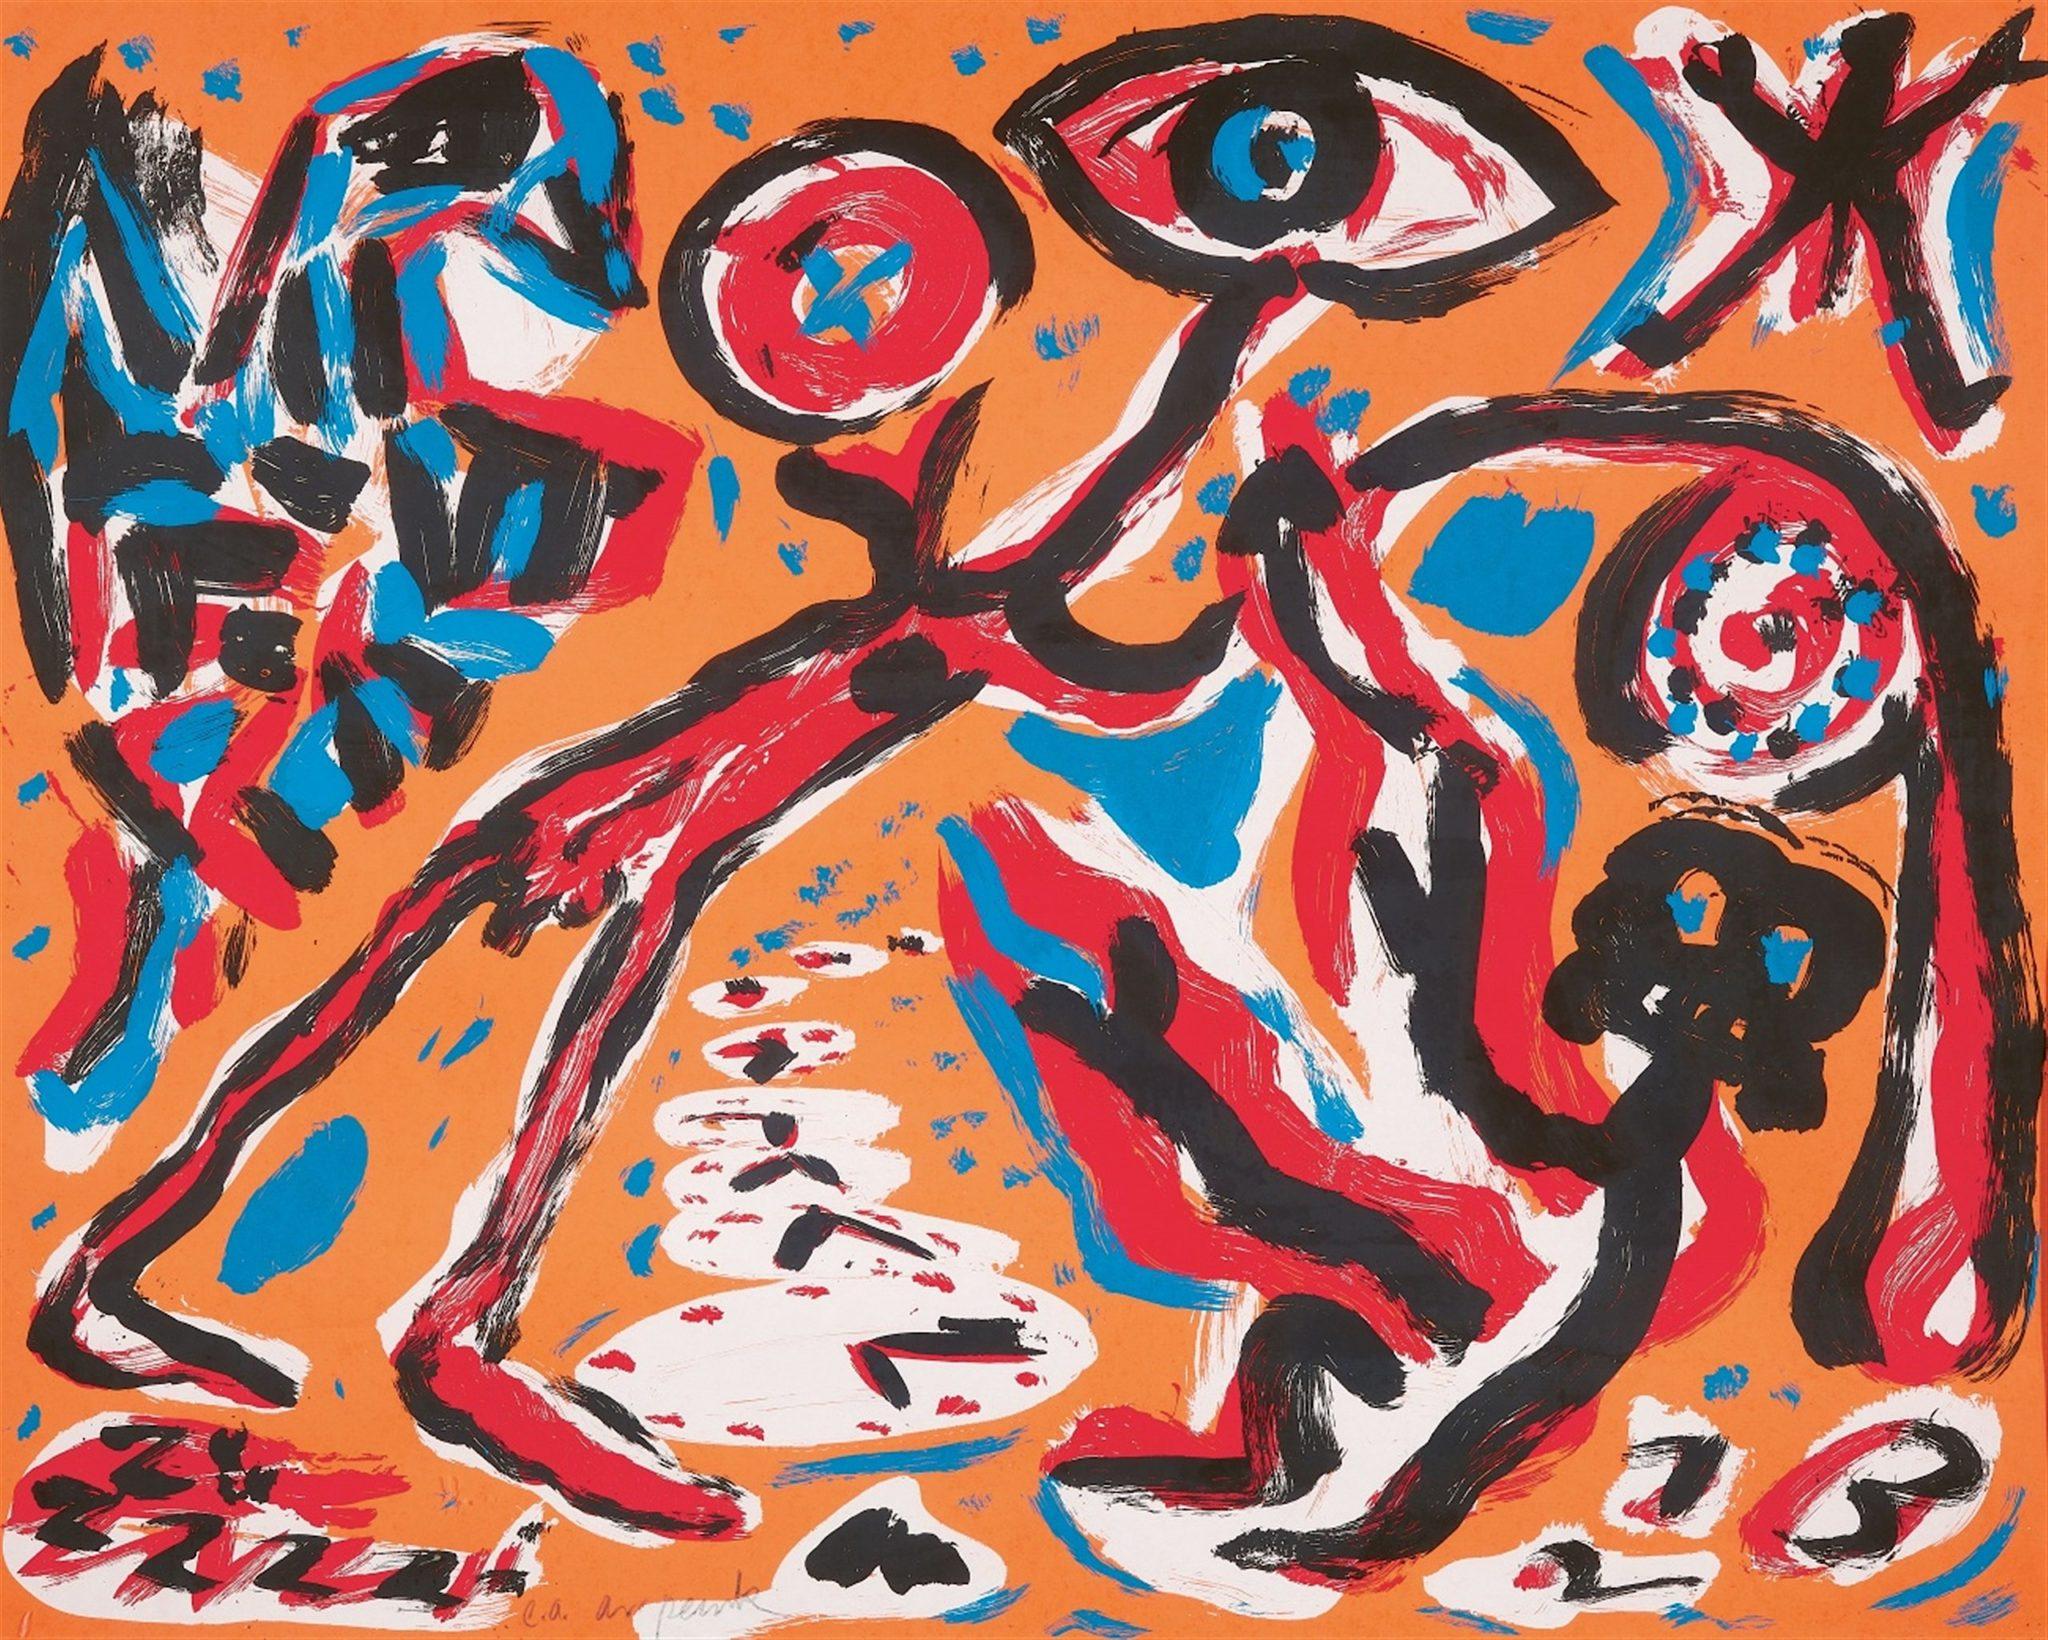 A.R. Penck silkscreen /55 90X110